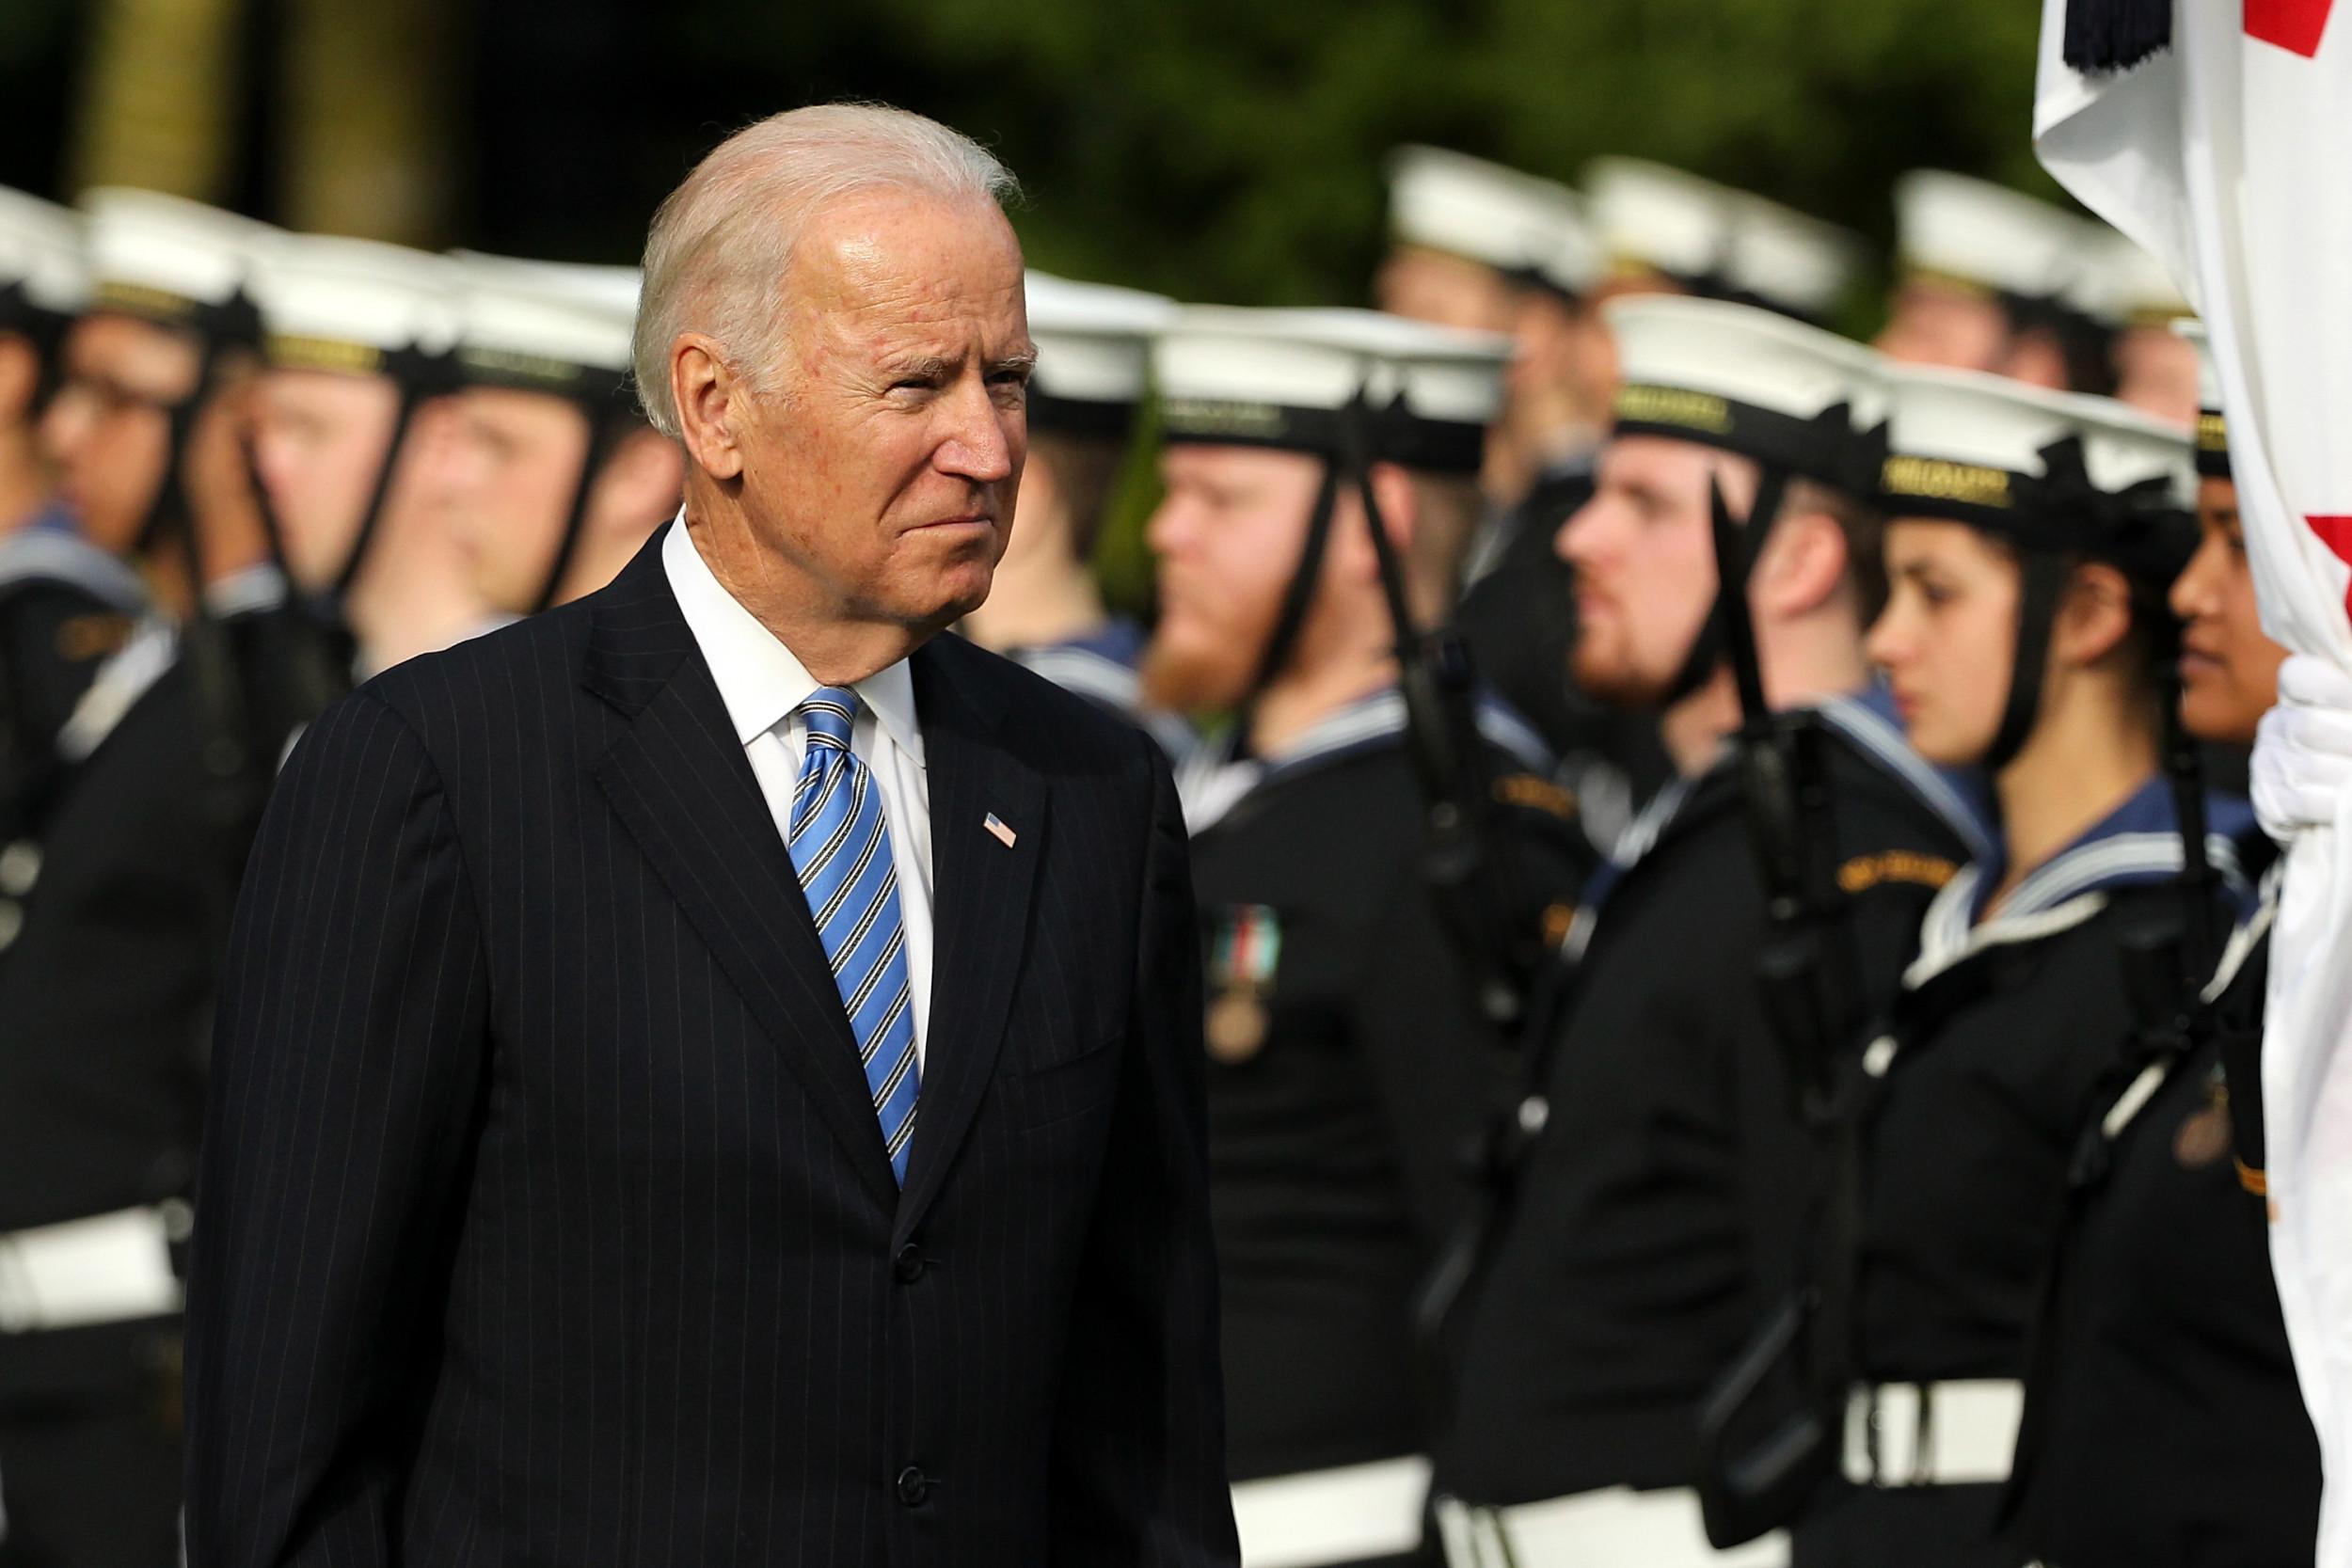 Joe Biden blasts Trump for pardoning U.S. service members linked to war crimes